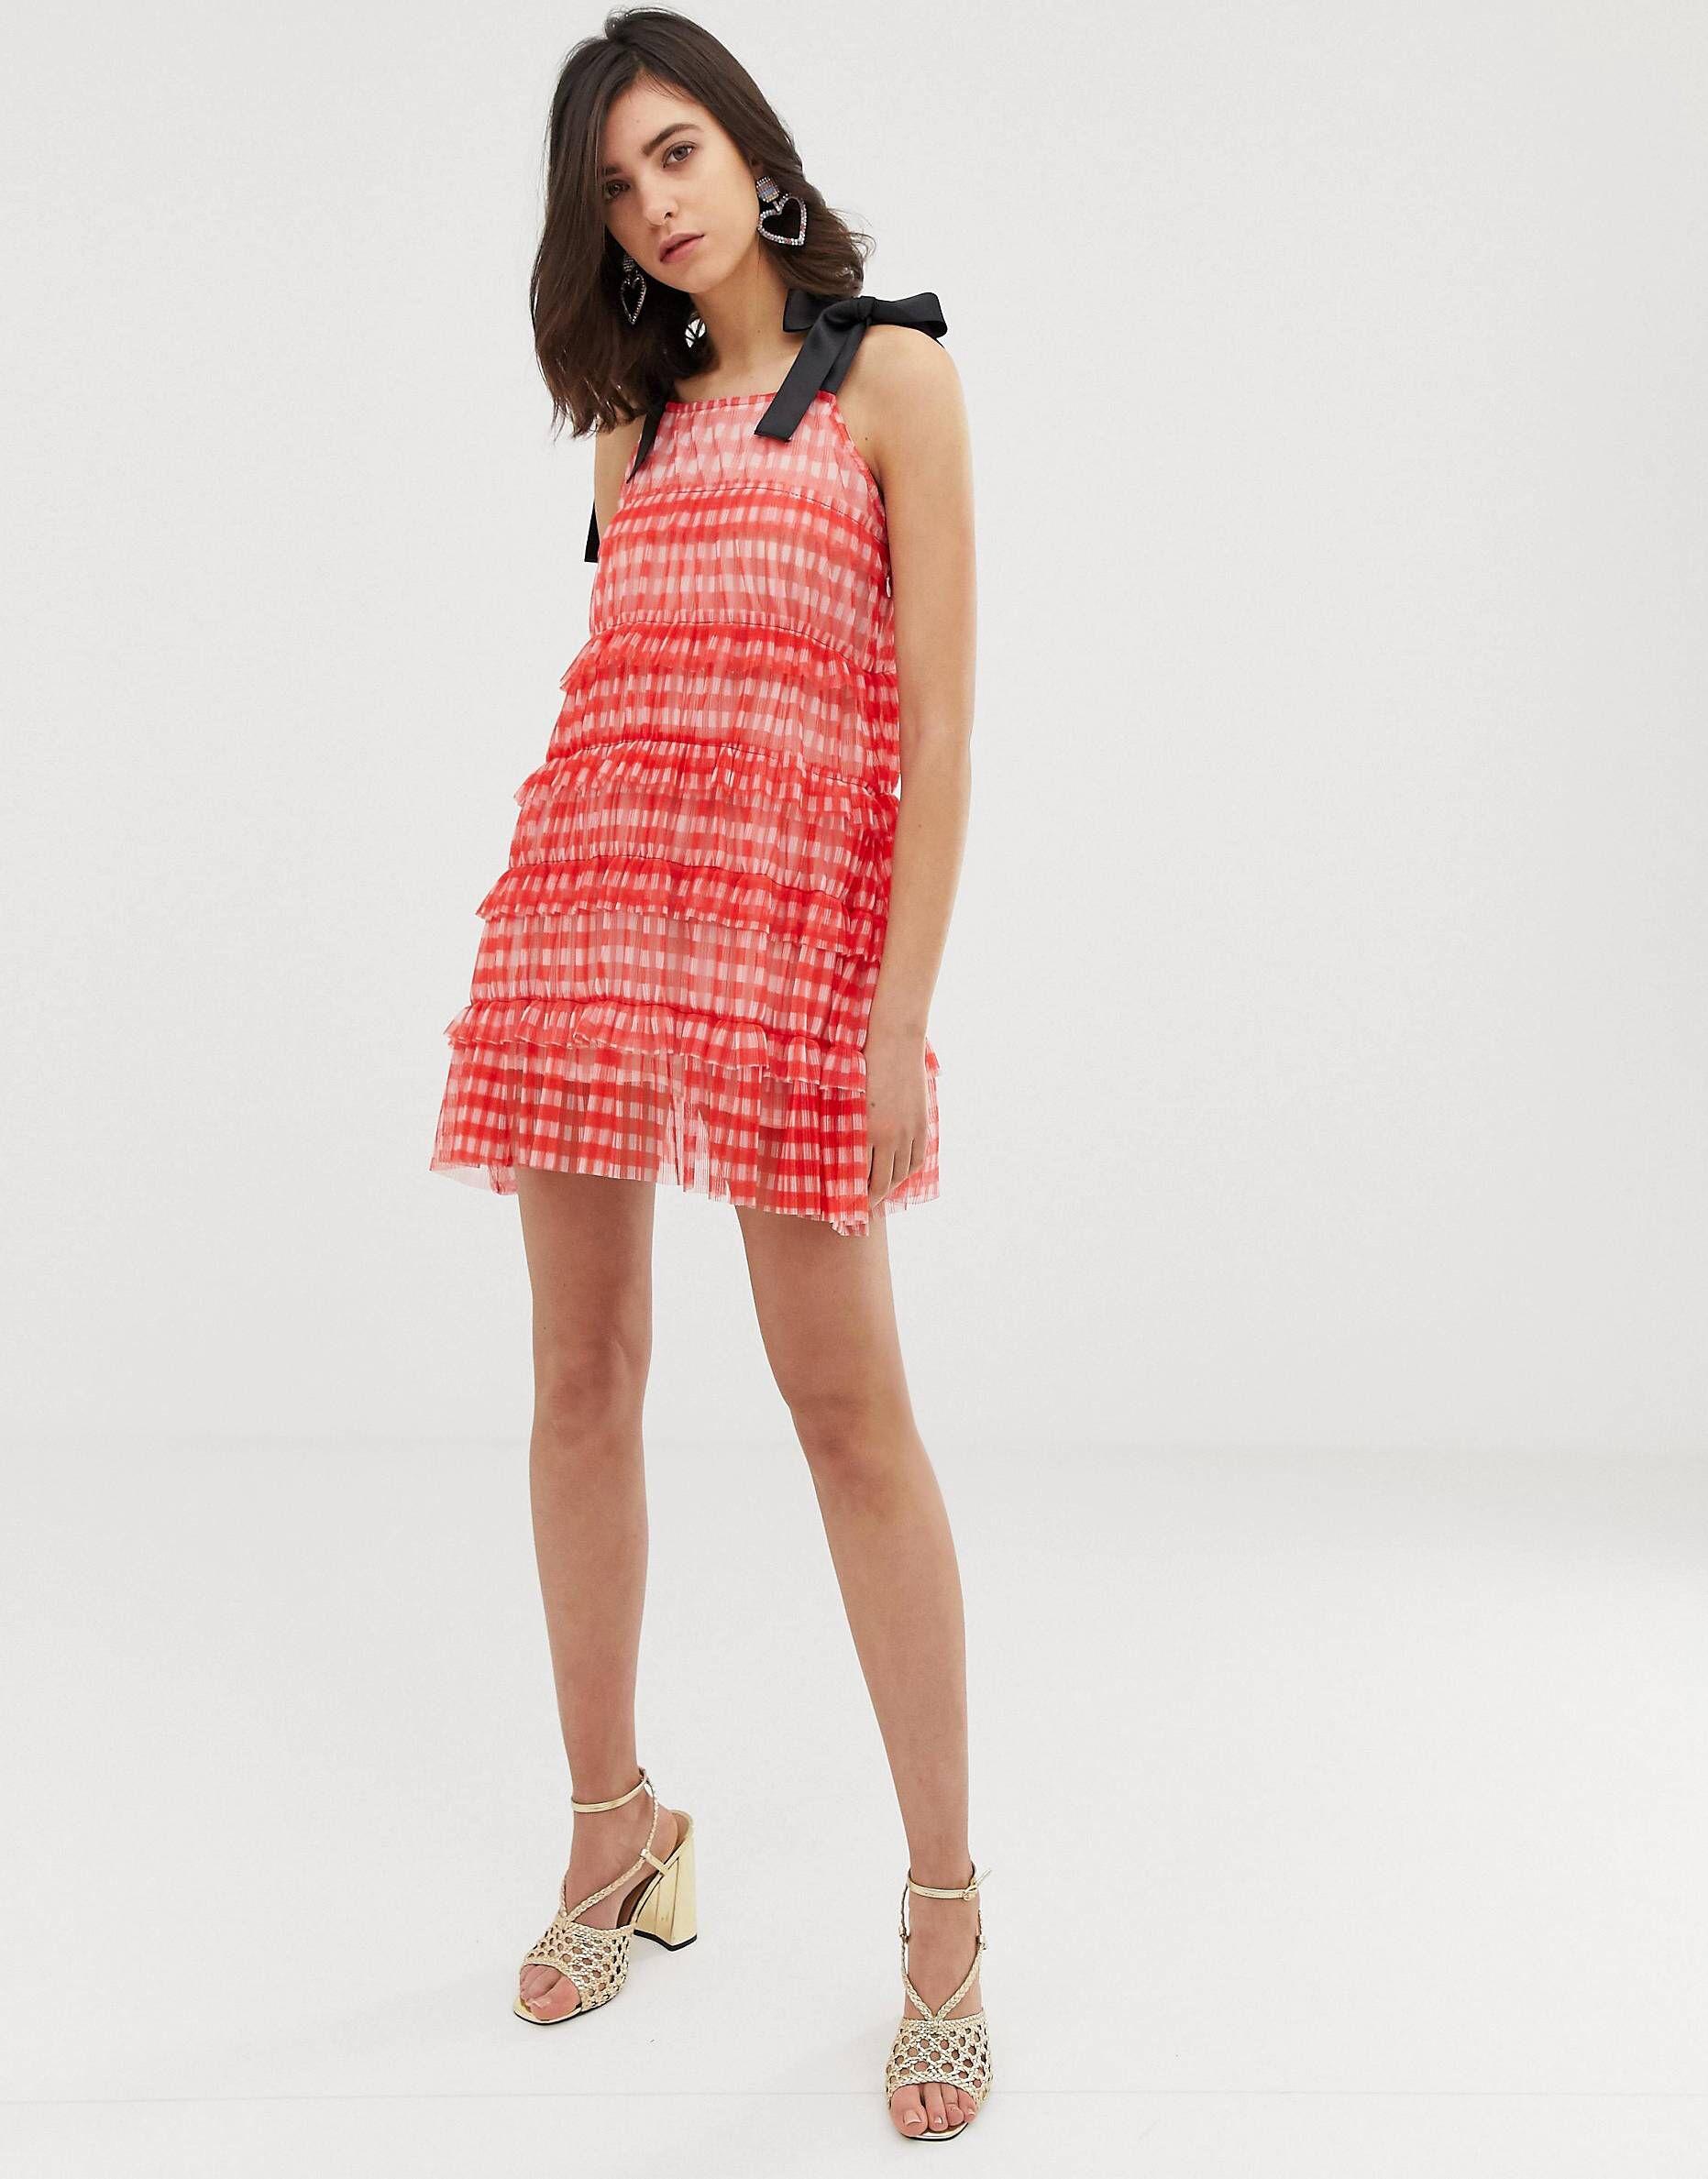 6a2b1b5756 Mode Online, Swing Dress, Gingham, Contrast, Fashion Online, Asos, Shoulder